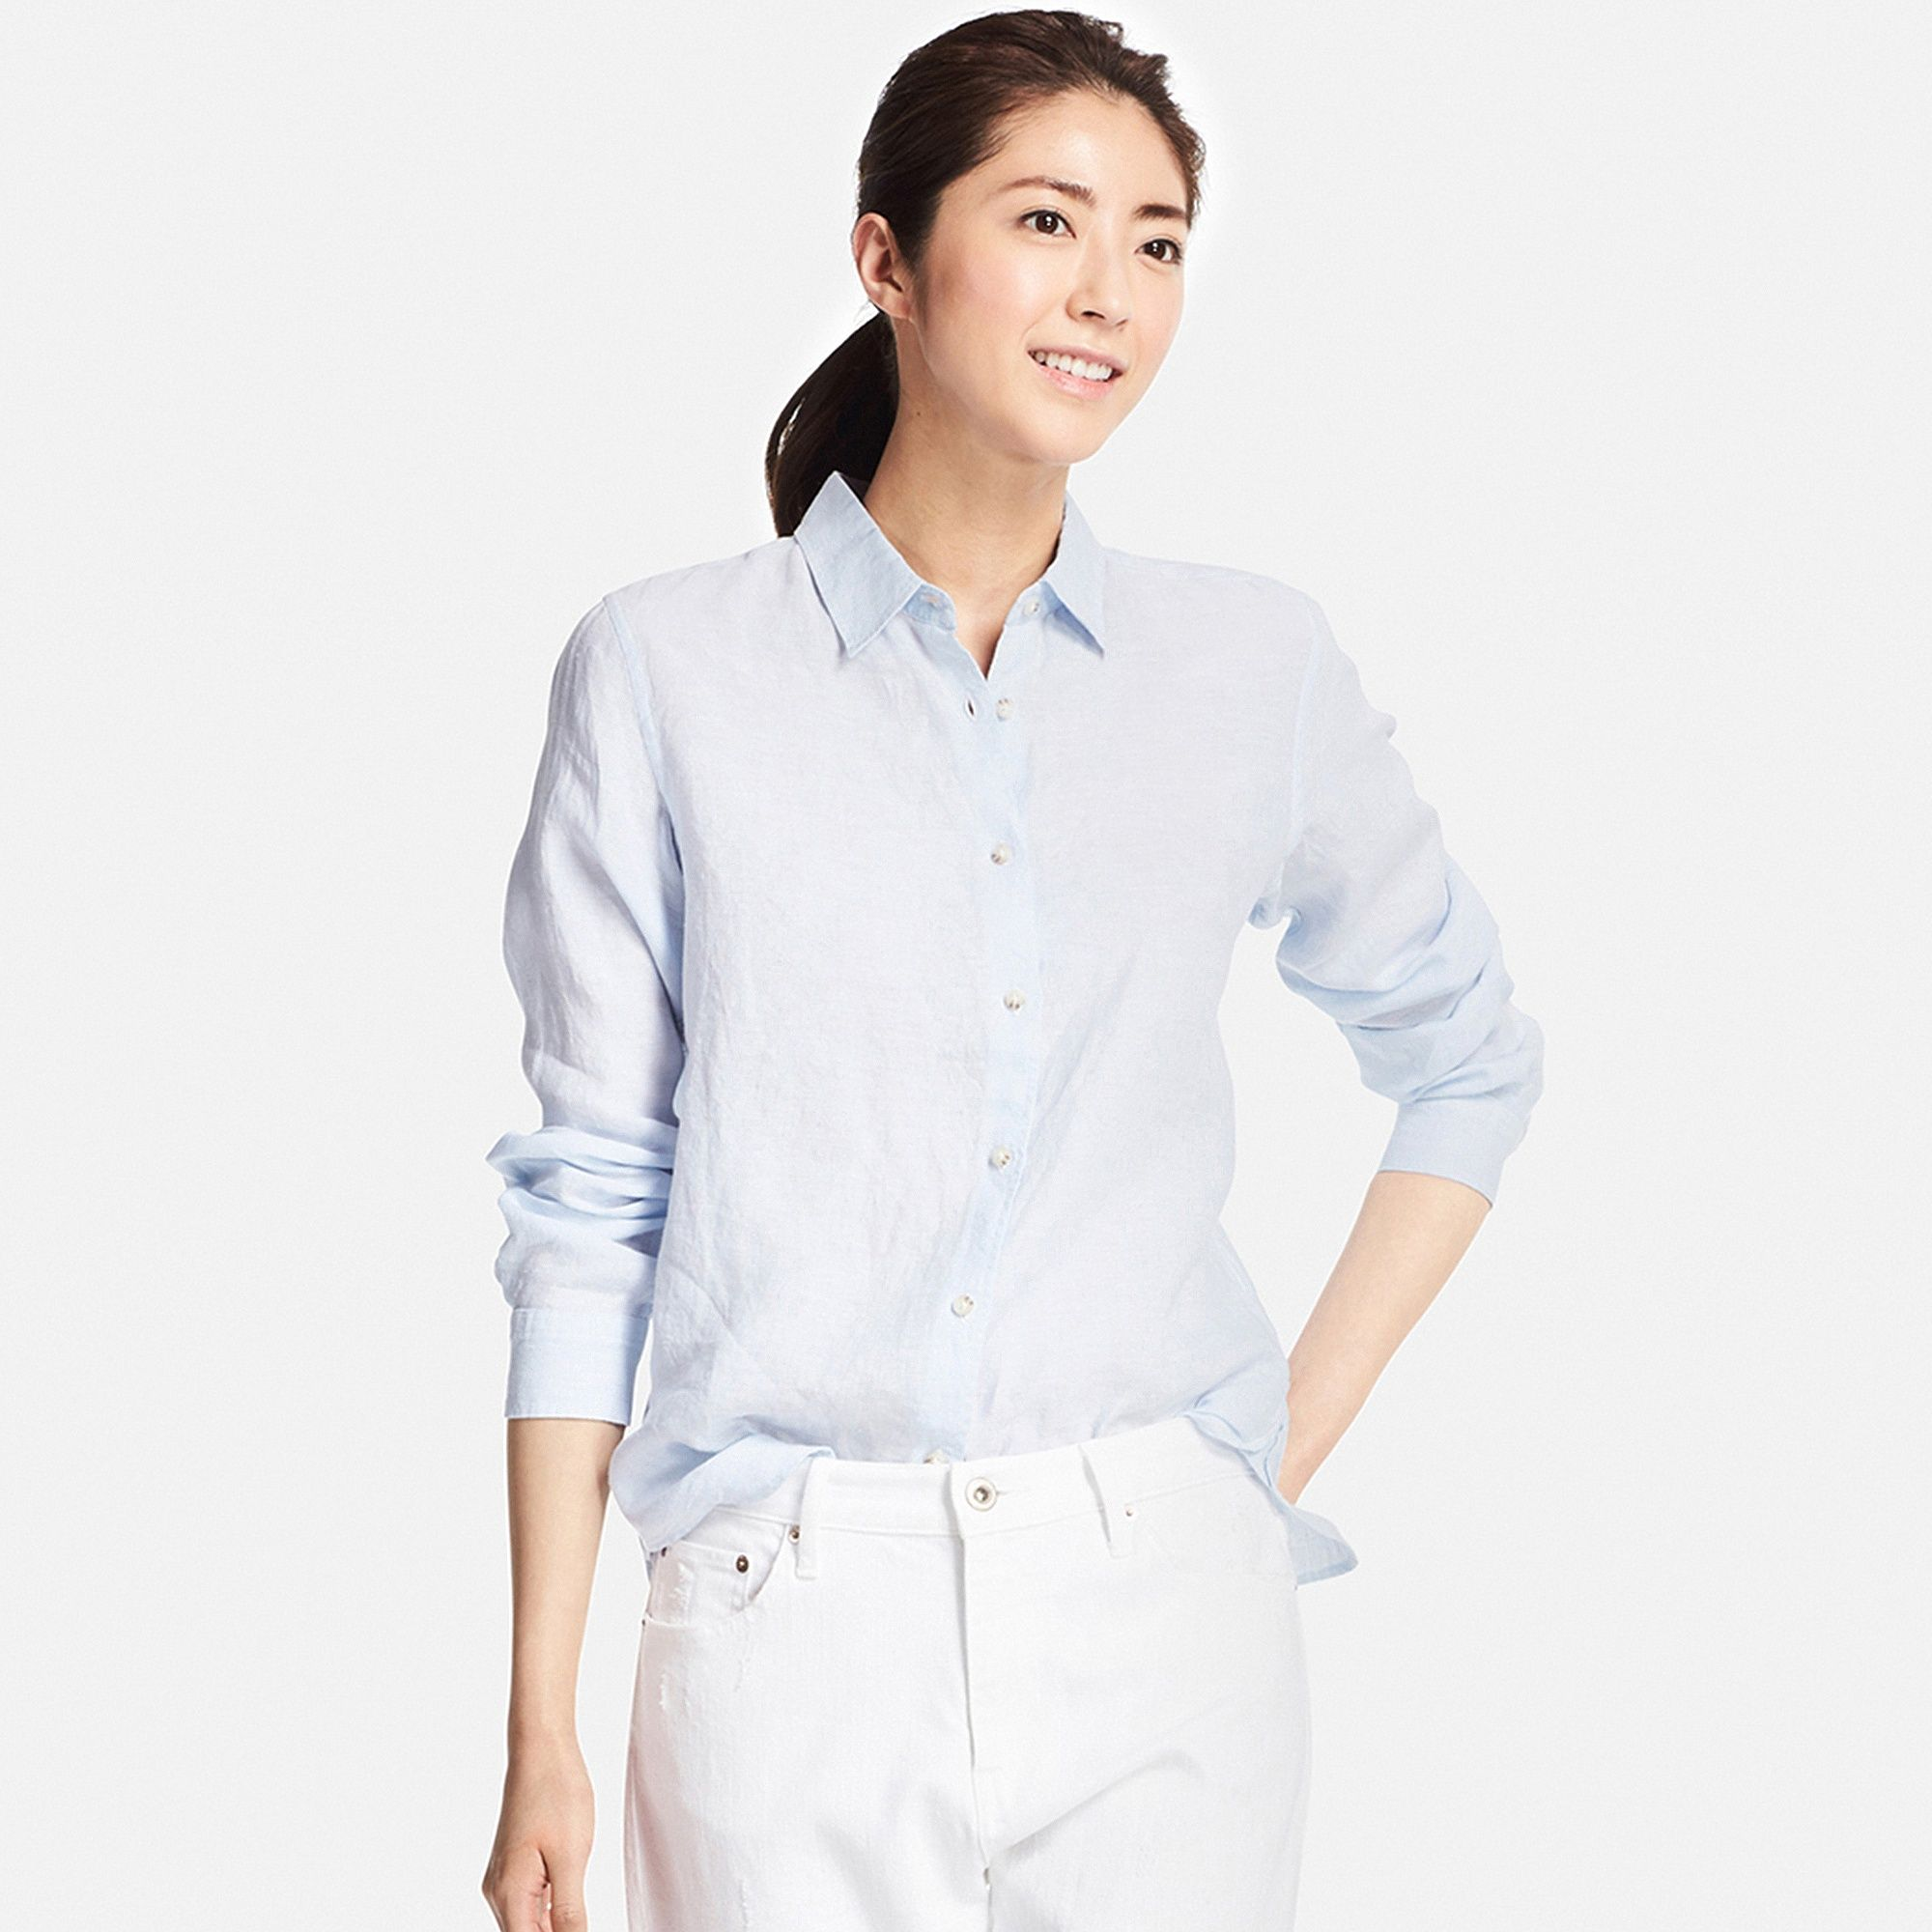 Uniqlo flannel jacket  WOMEN Premium Linen Long Sleeve Shirt  UNIQLO  Shirt uniqlo